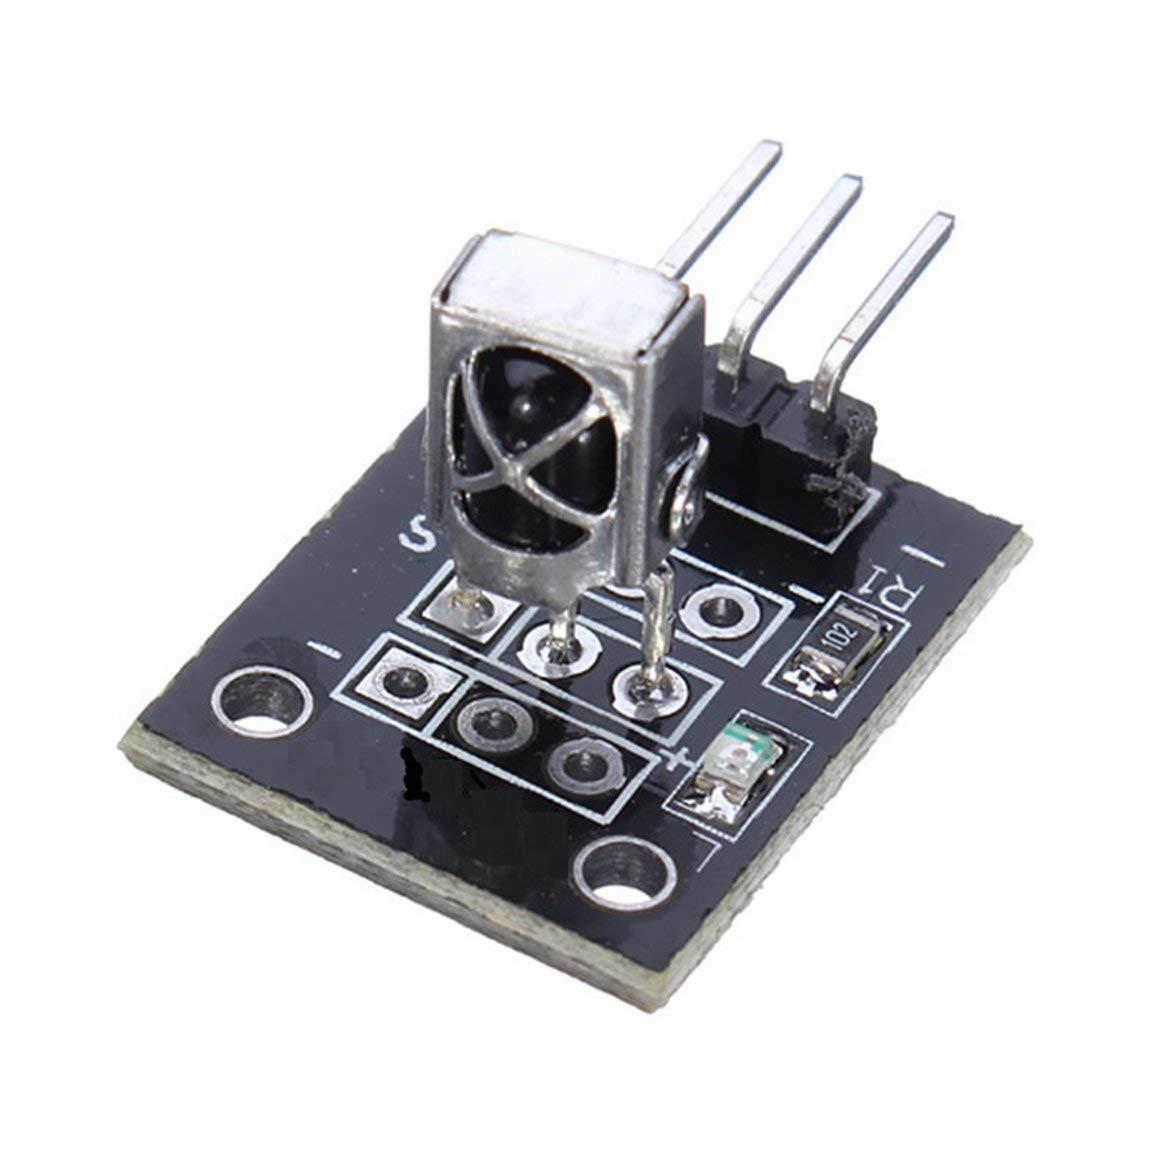 Kongqiabona 5PCS KY-022 37.9KHz Infrared IR Sensor Receiver Module For Arduino AVR PIC TW